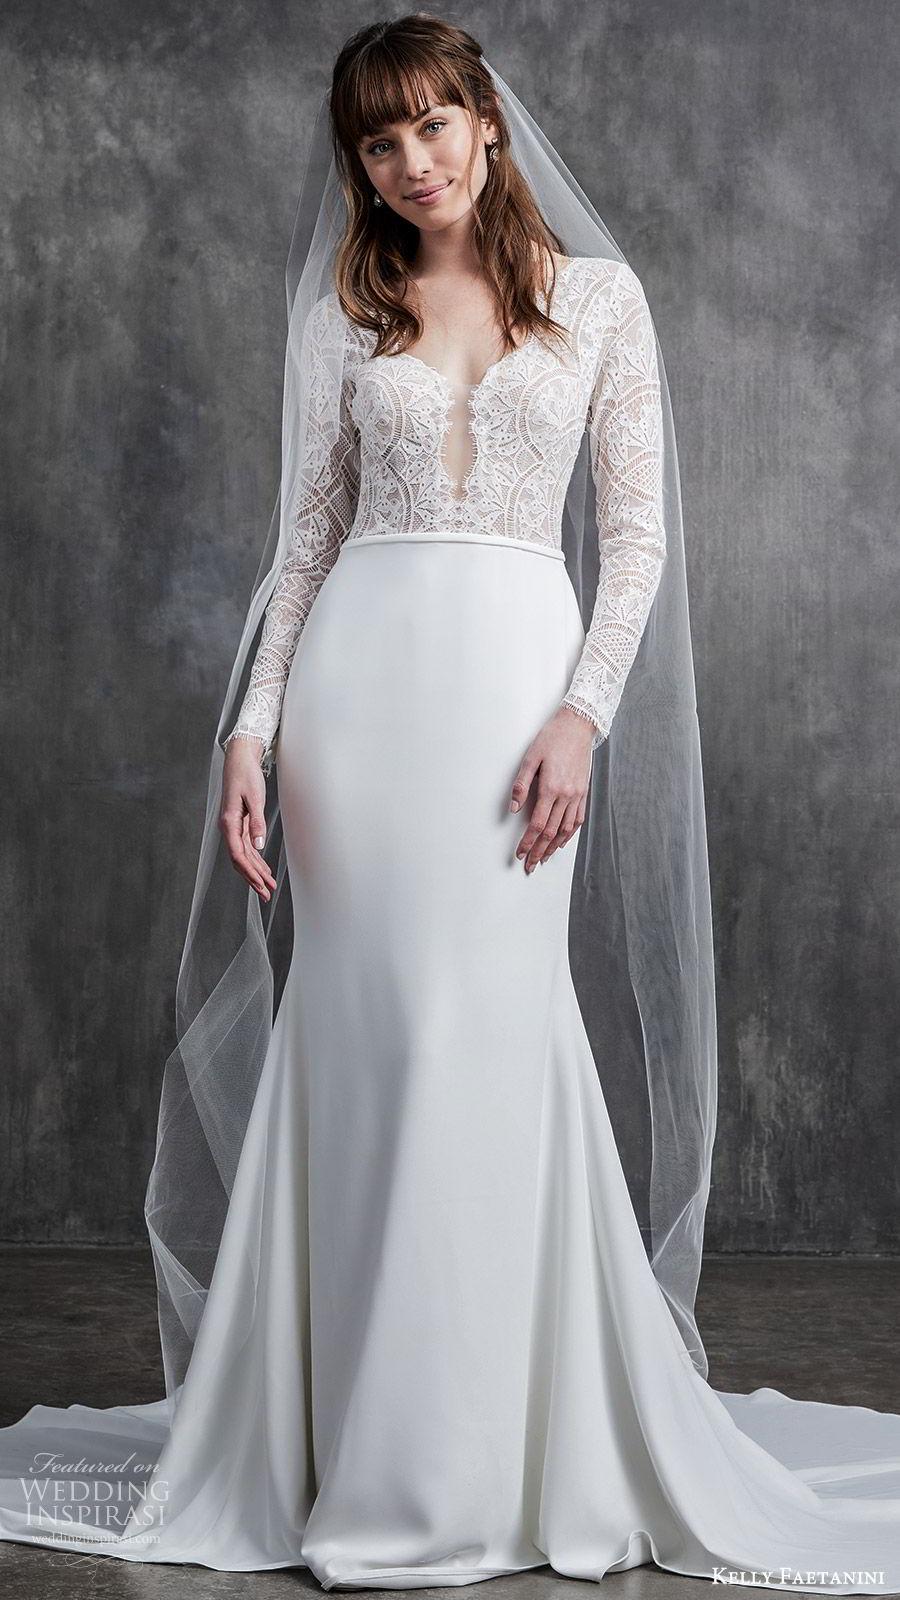 kelly faetanini spring 2020 bridal illusion long sleeves v neckline lace bodice fit flare modified a line mermaid wedding dress (2) chapel train elegant mv